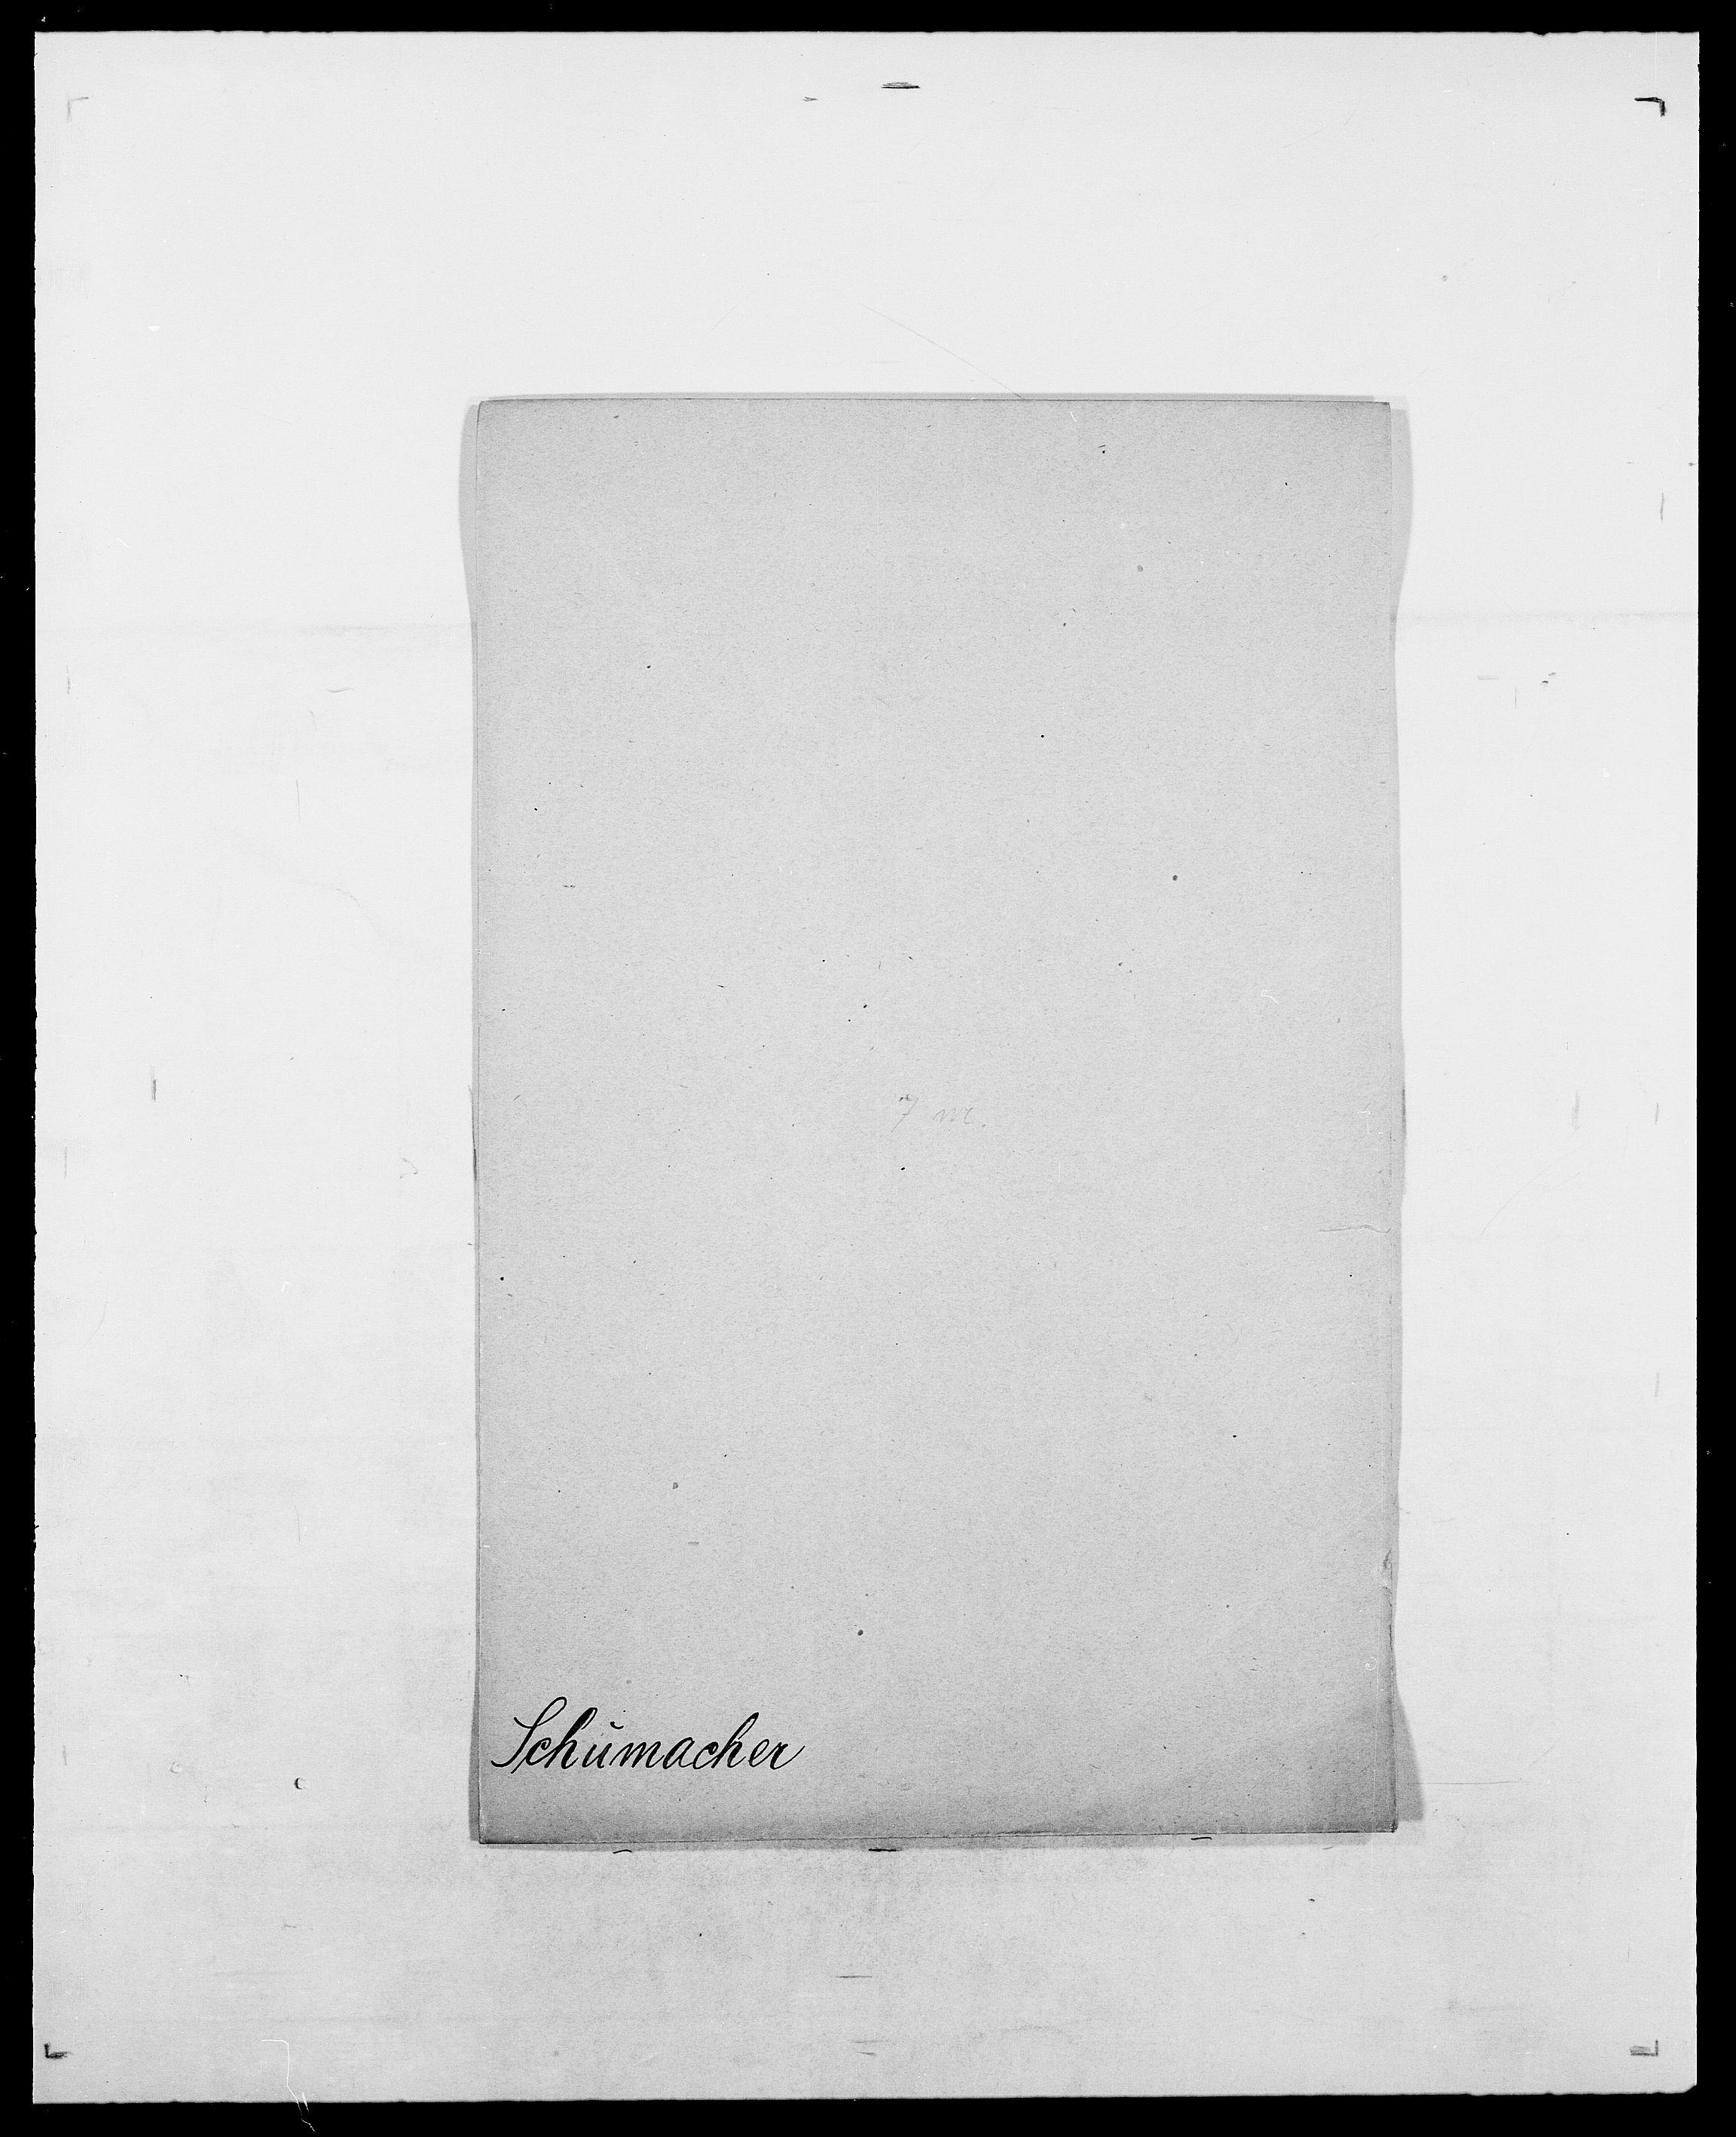 SAO, Delgobe, Charles Antoine - samling, D/Da/L0035: Schnabel - sjetman, s. 343